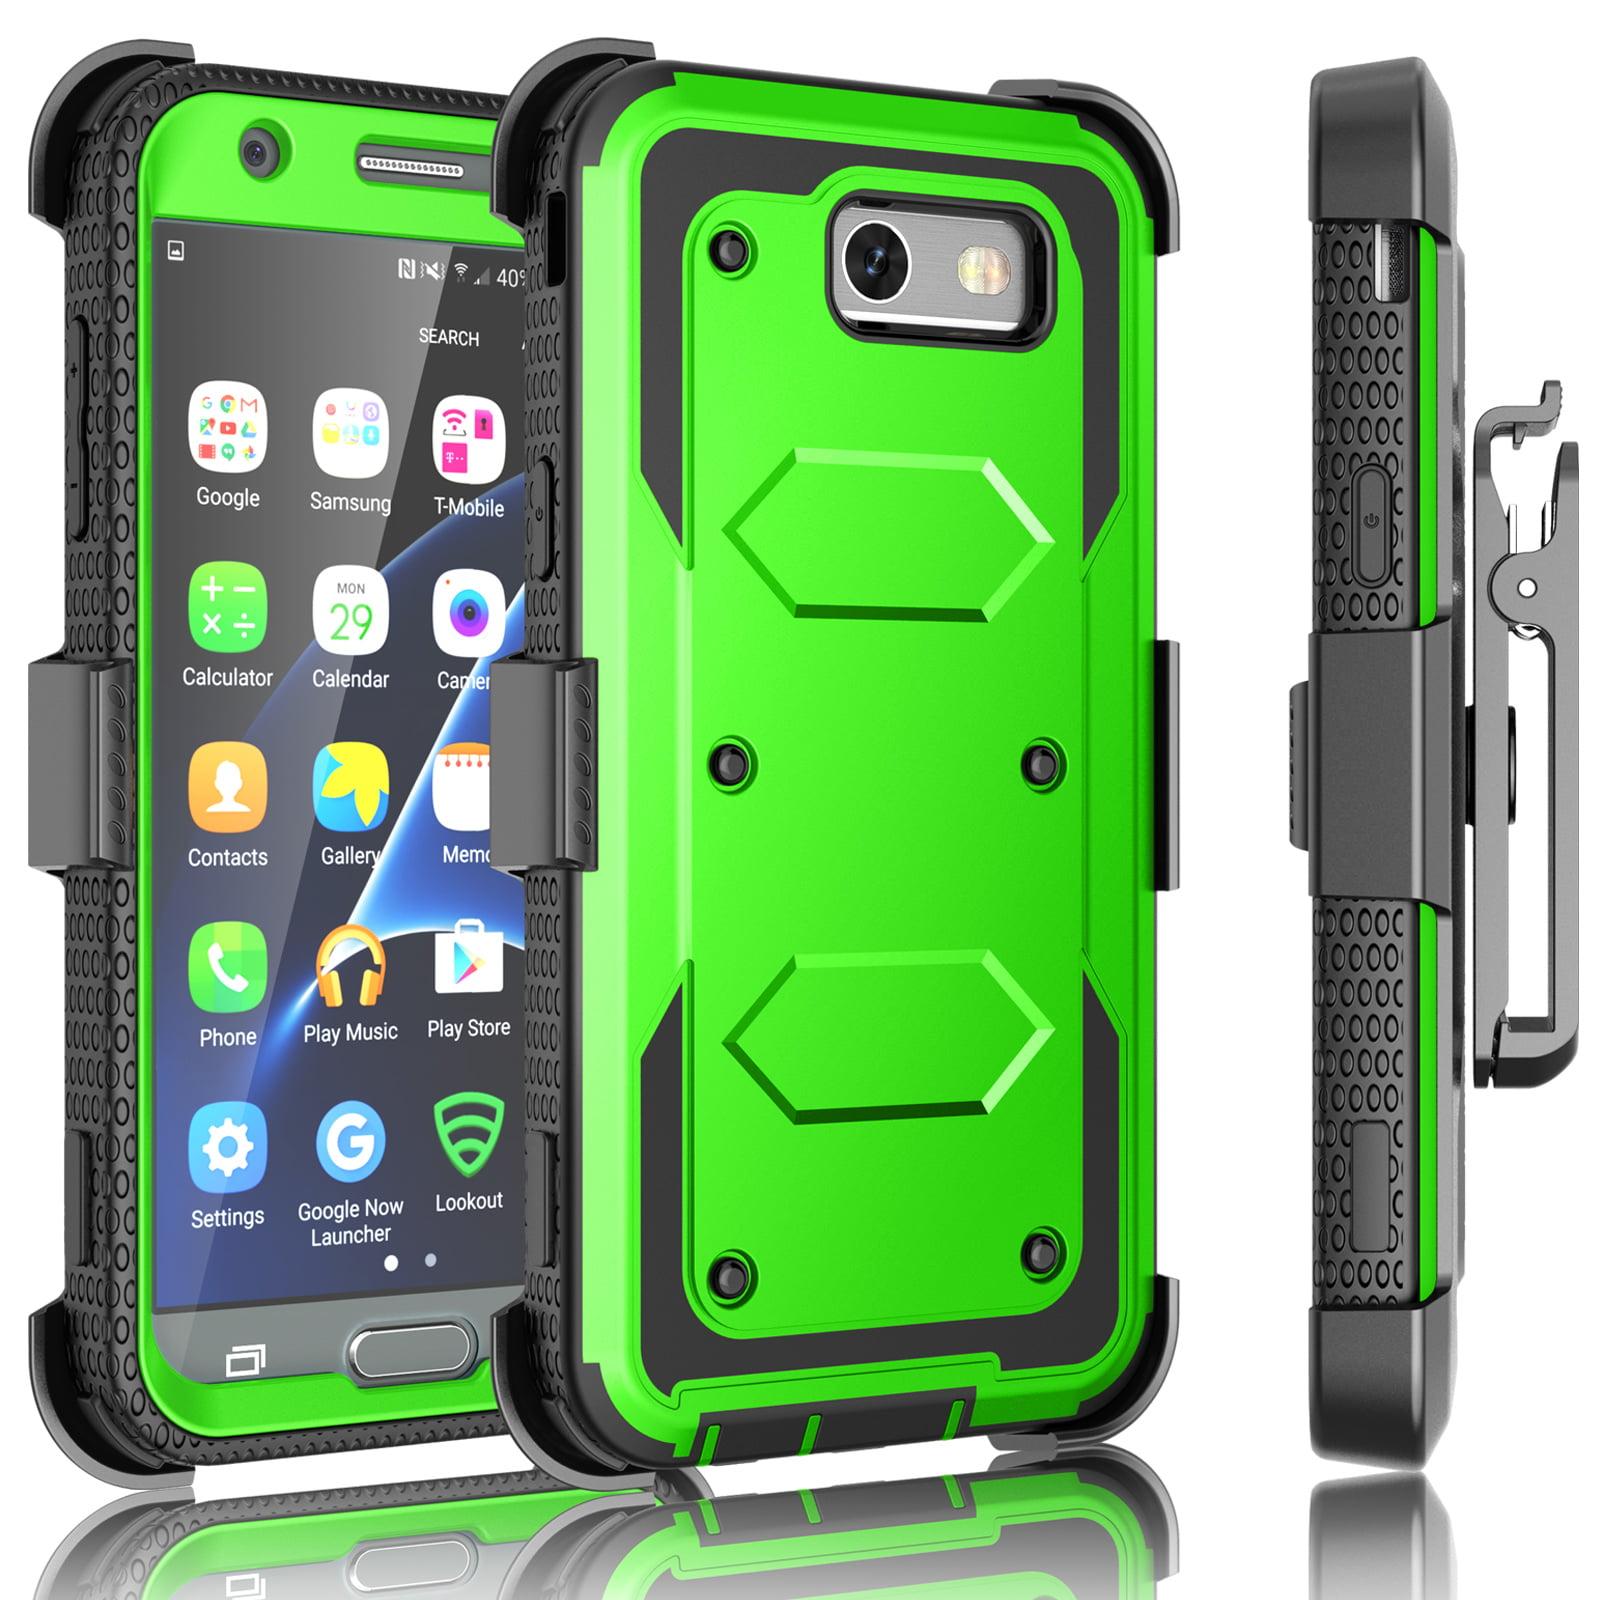 quality design e6edb 991dc J3 Emerge / J3 Prime Case, Samsung Galaxy J3 Mission / J3 Eclipse / Express  Prime 2/ Amp Prime 2/ J3 Luna Pro Holster Clip, Tekcoo [Tshell Green] ...